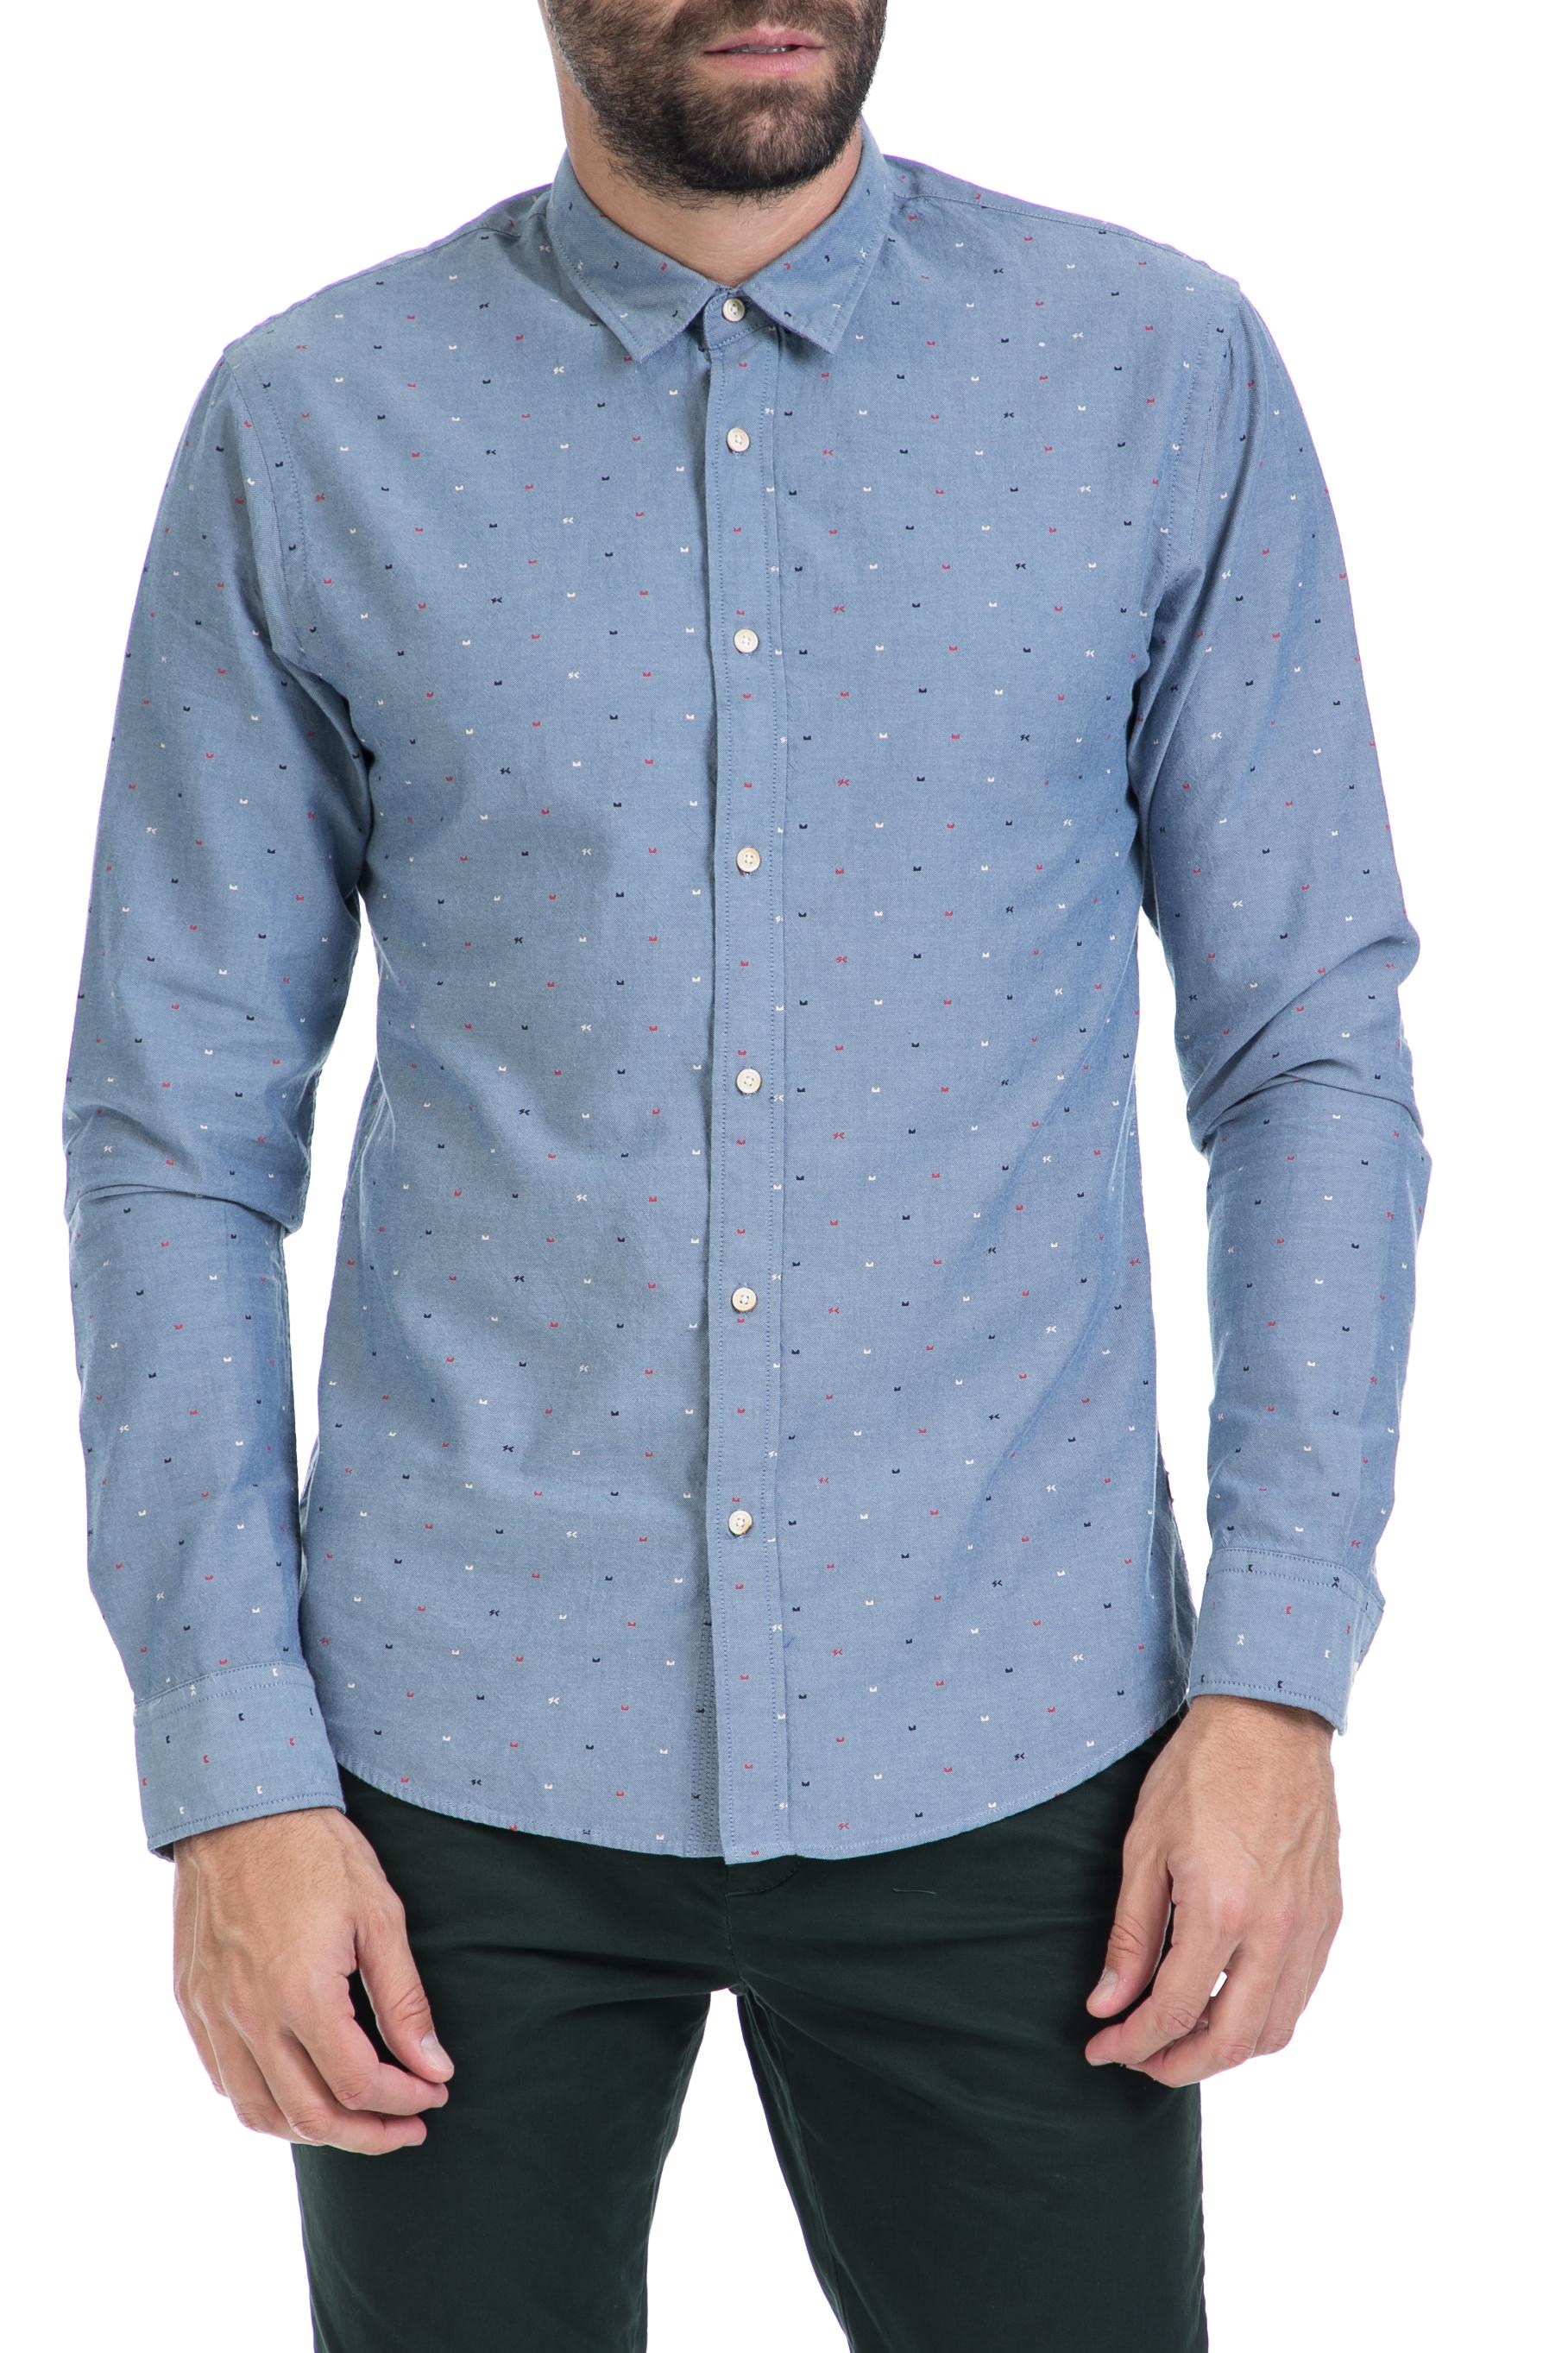 3fee36c1833c SCOTCH   SODA – Ανδρικό πουκάμισο Classic oxford shirt SCOTCH   SODA μπλε  1566474.0-0904 47